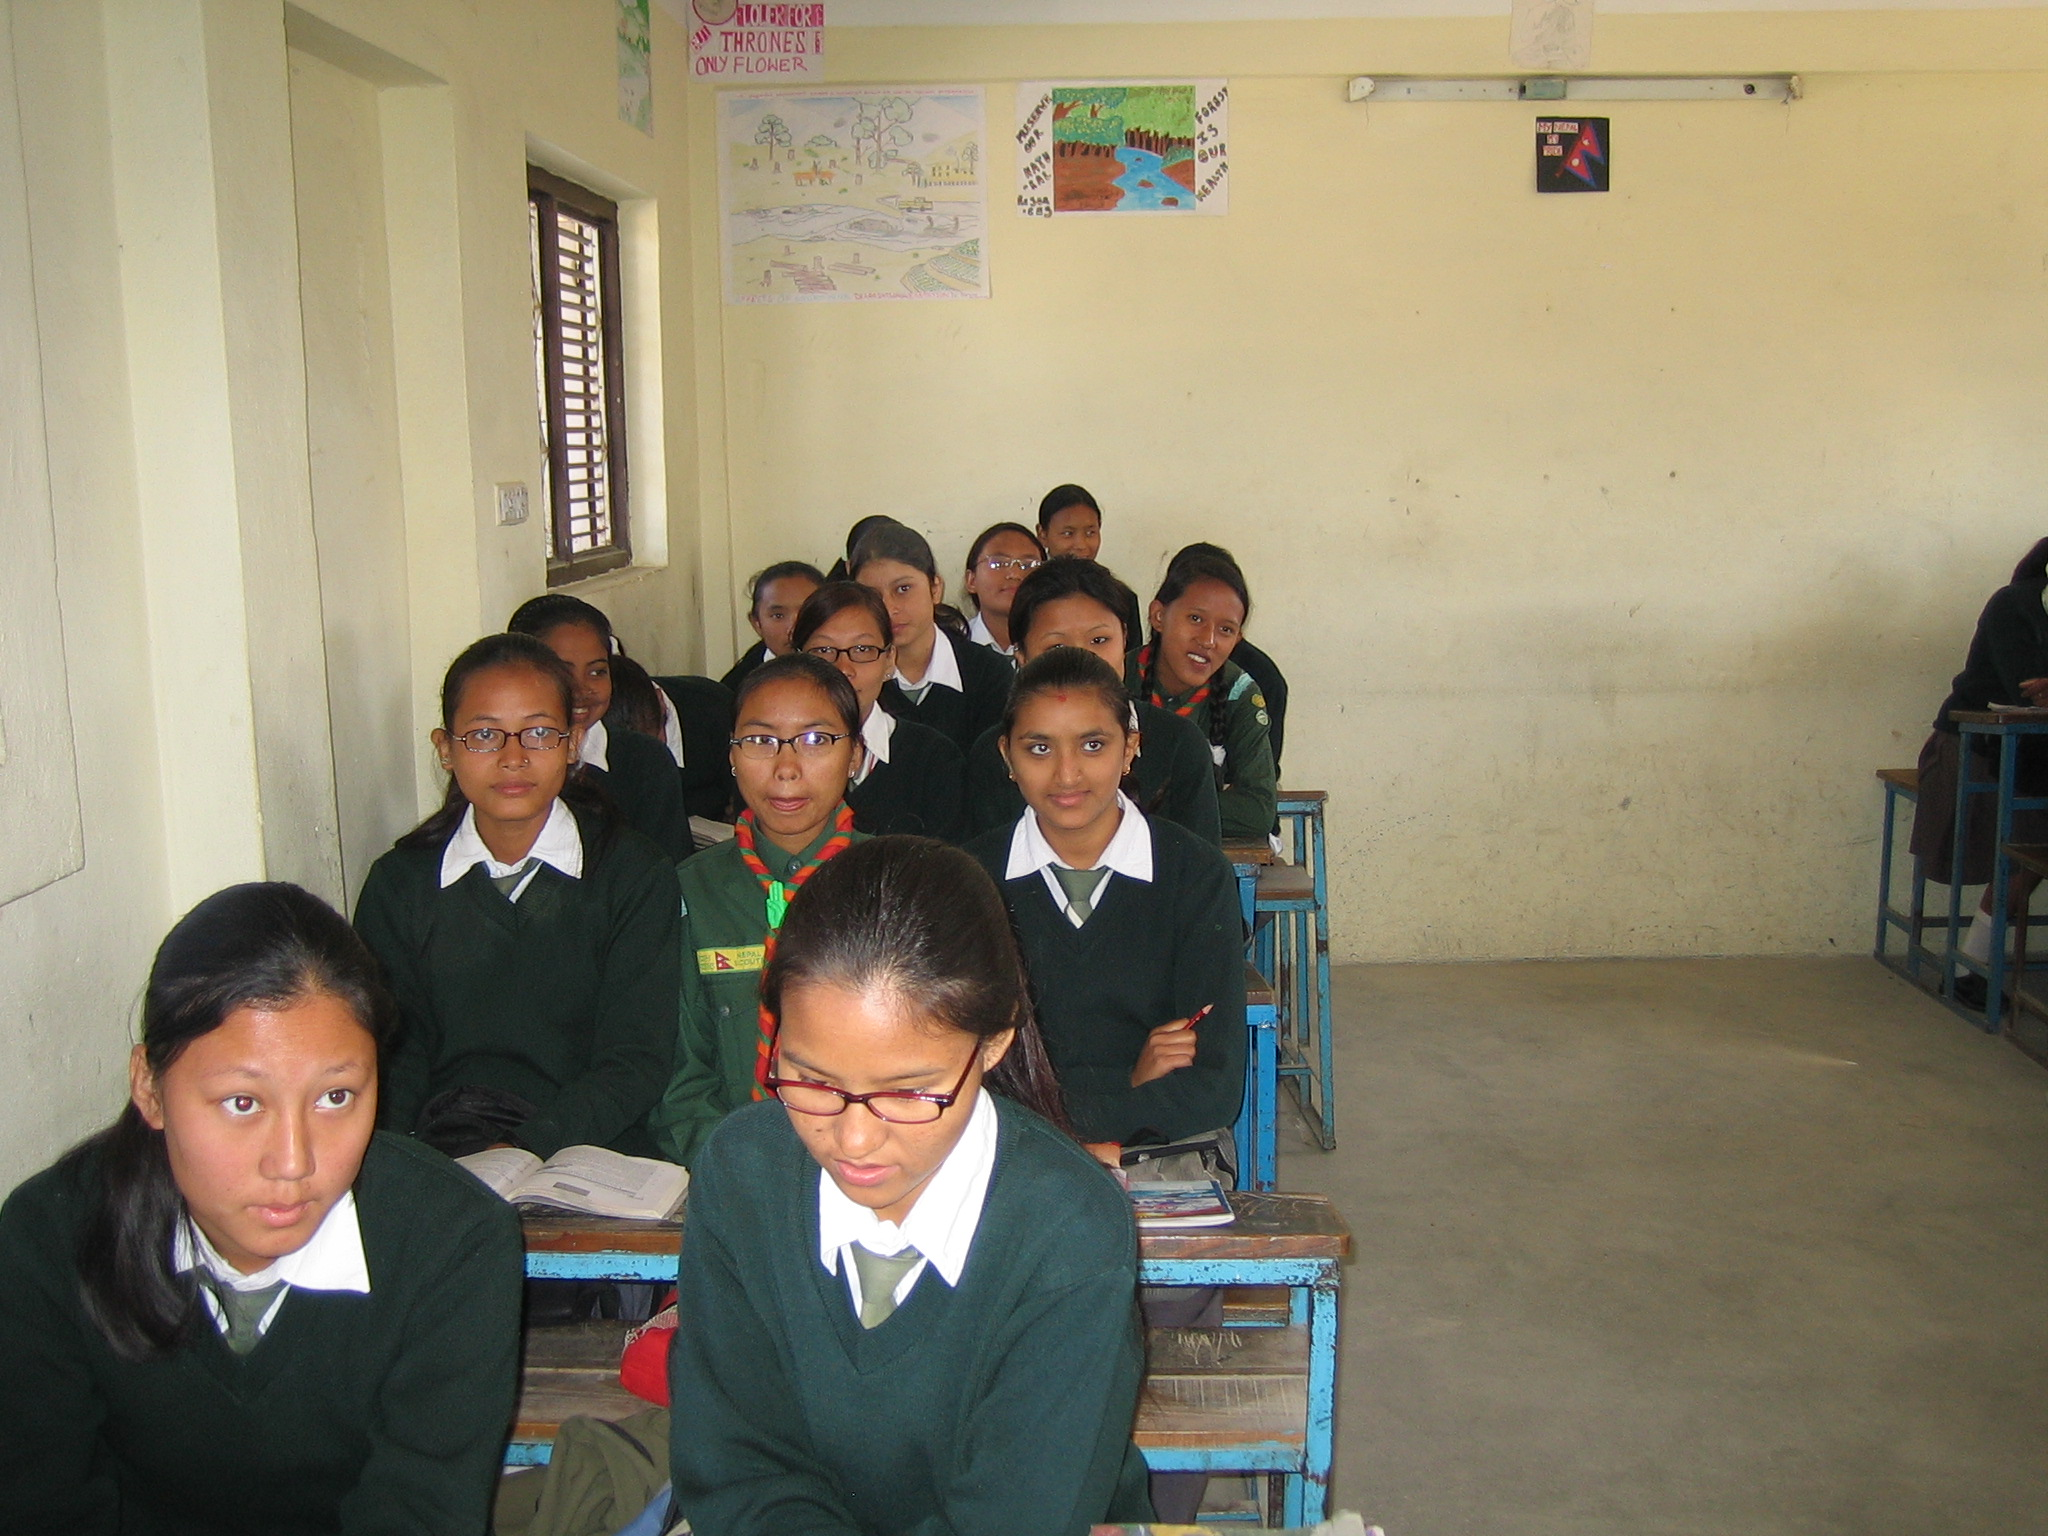 Nepal2007Håkon 068